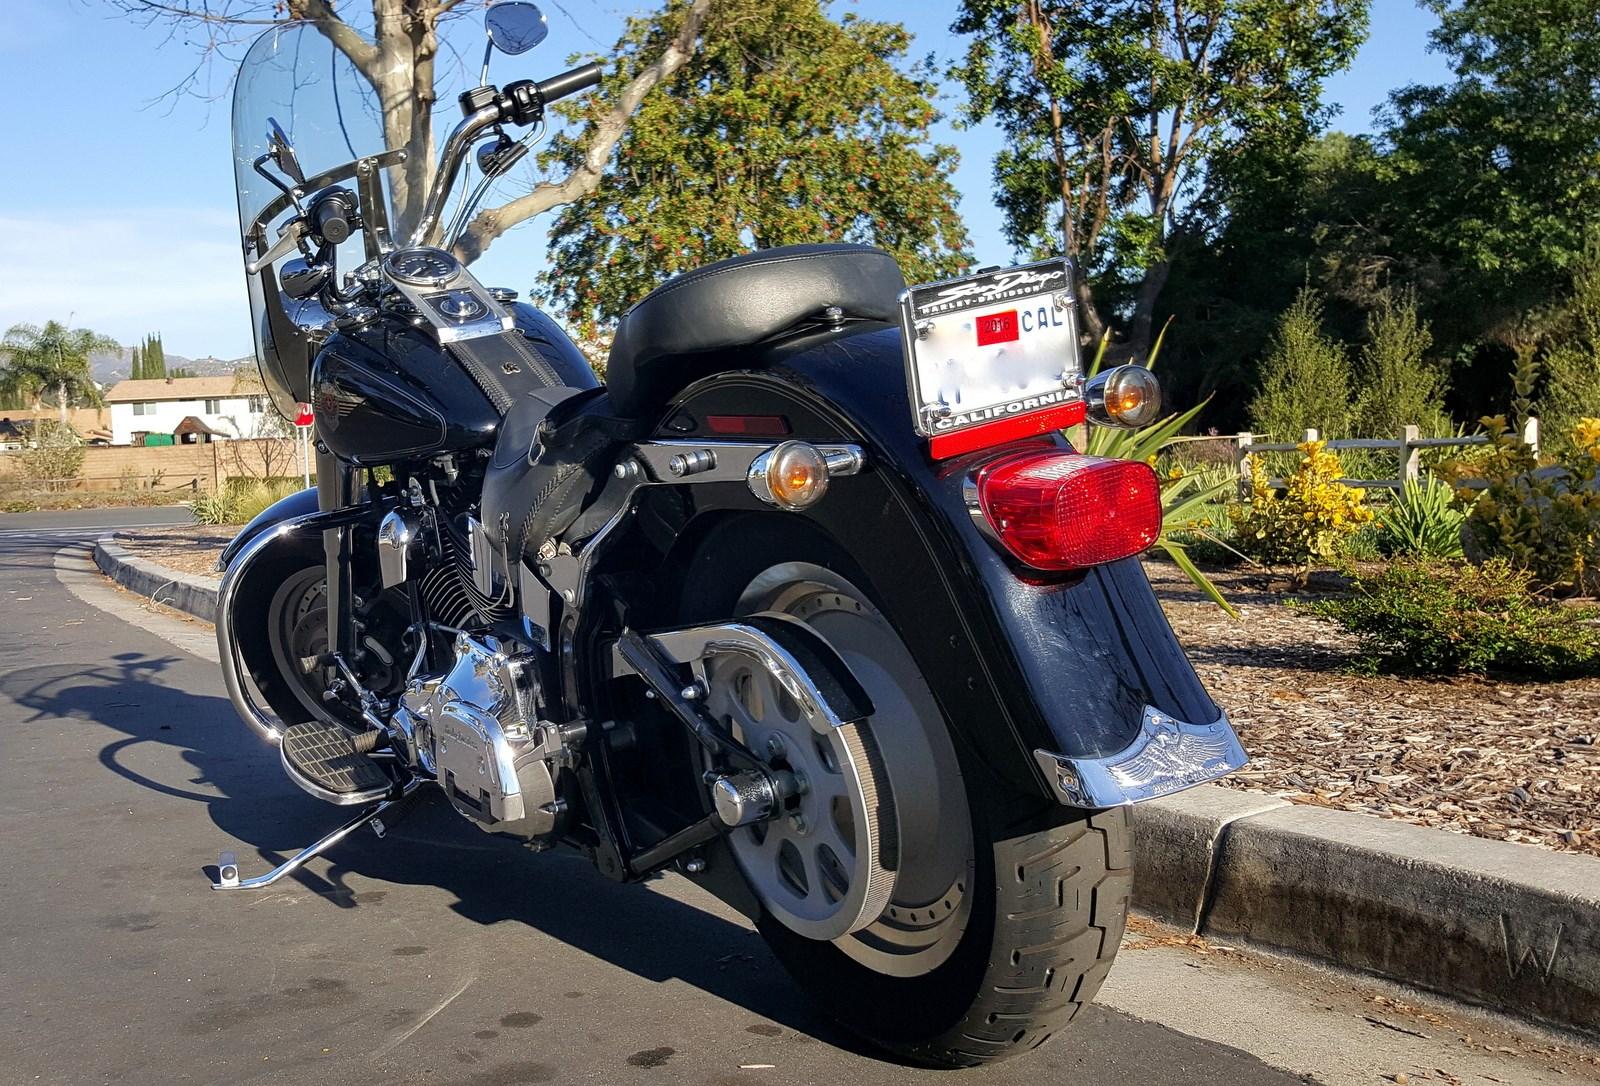 2017 Harley Motorcycle Dealer Poway Ca >> 2004 Harley-Davidson® FLSTF/I Softail® Fat Boy® (Black), Poway, California (636351 ...